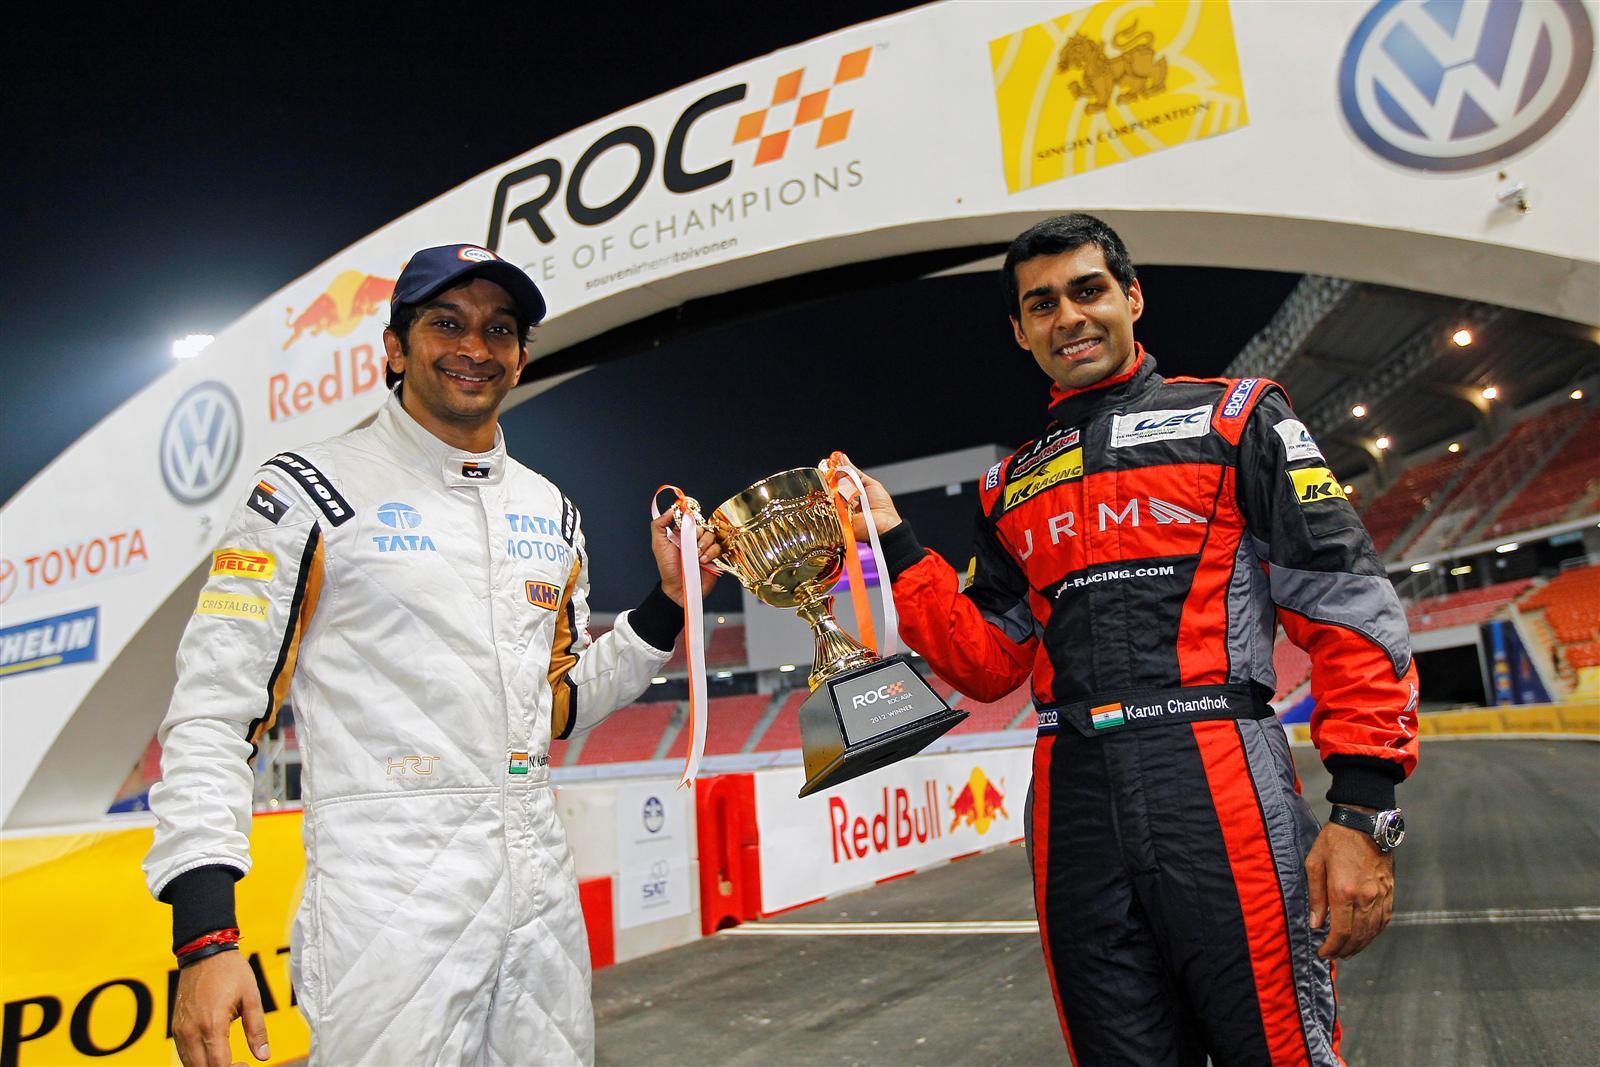 ROC-Asia-winners-Narain-Karthikeyan-Karun-Chandhok